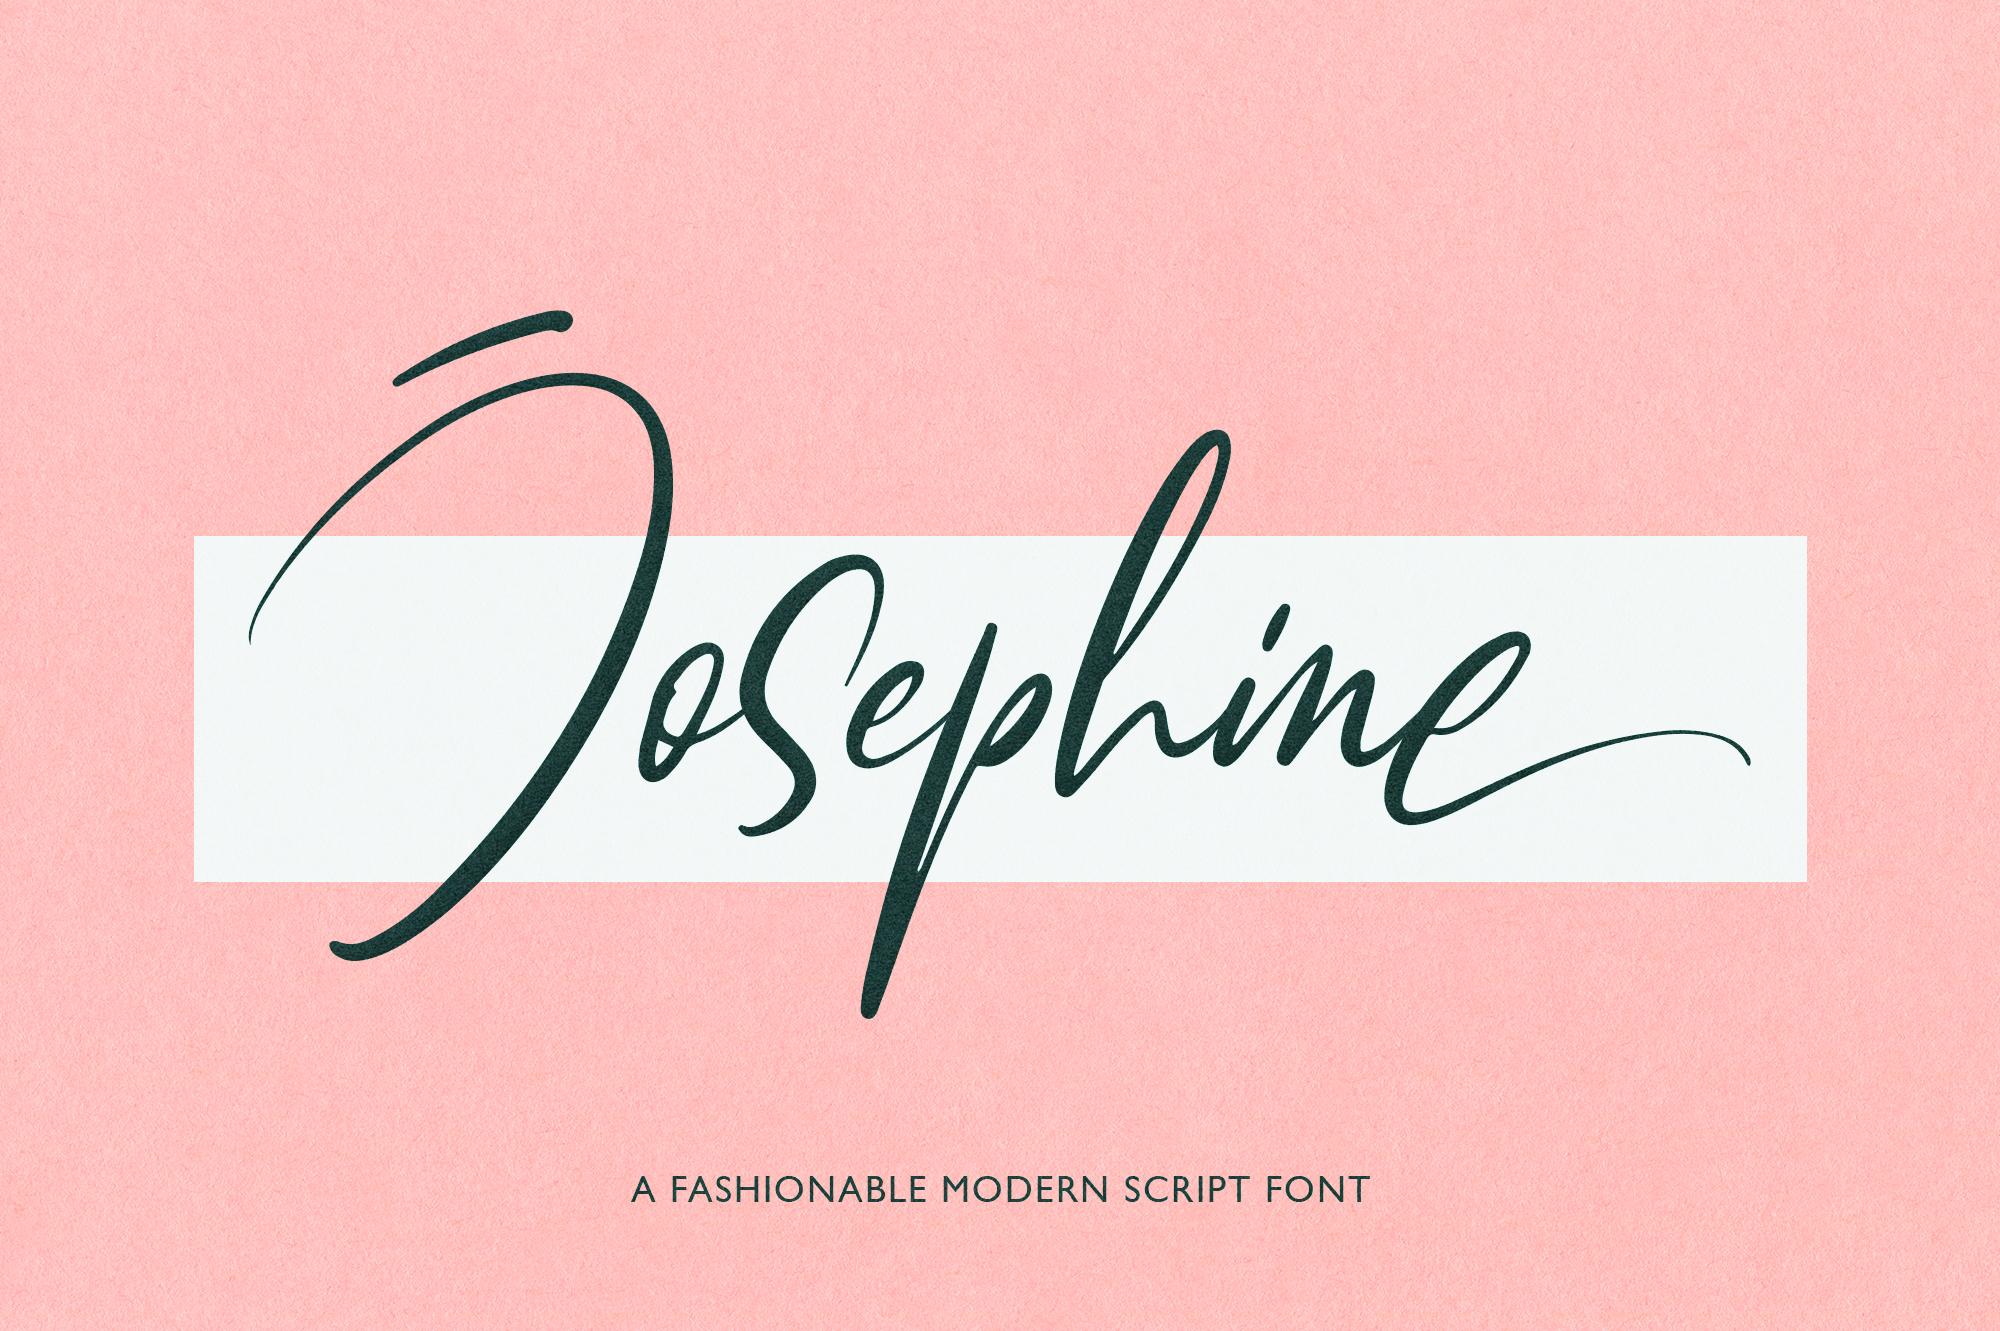 Josephine Fashionable Script Font example image 1